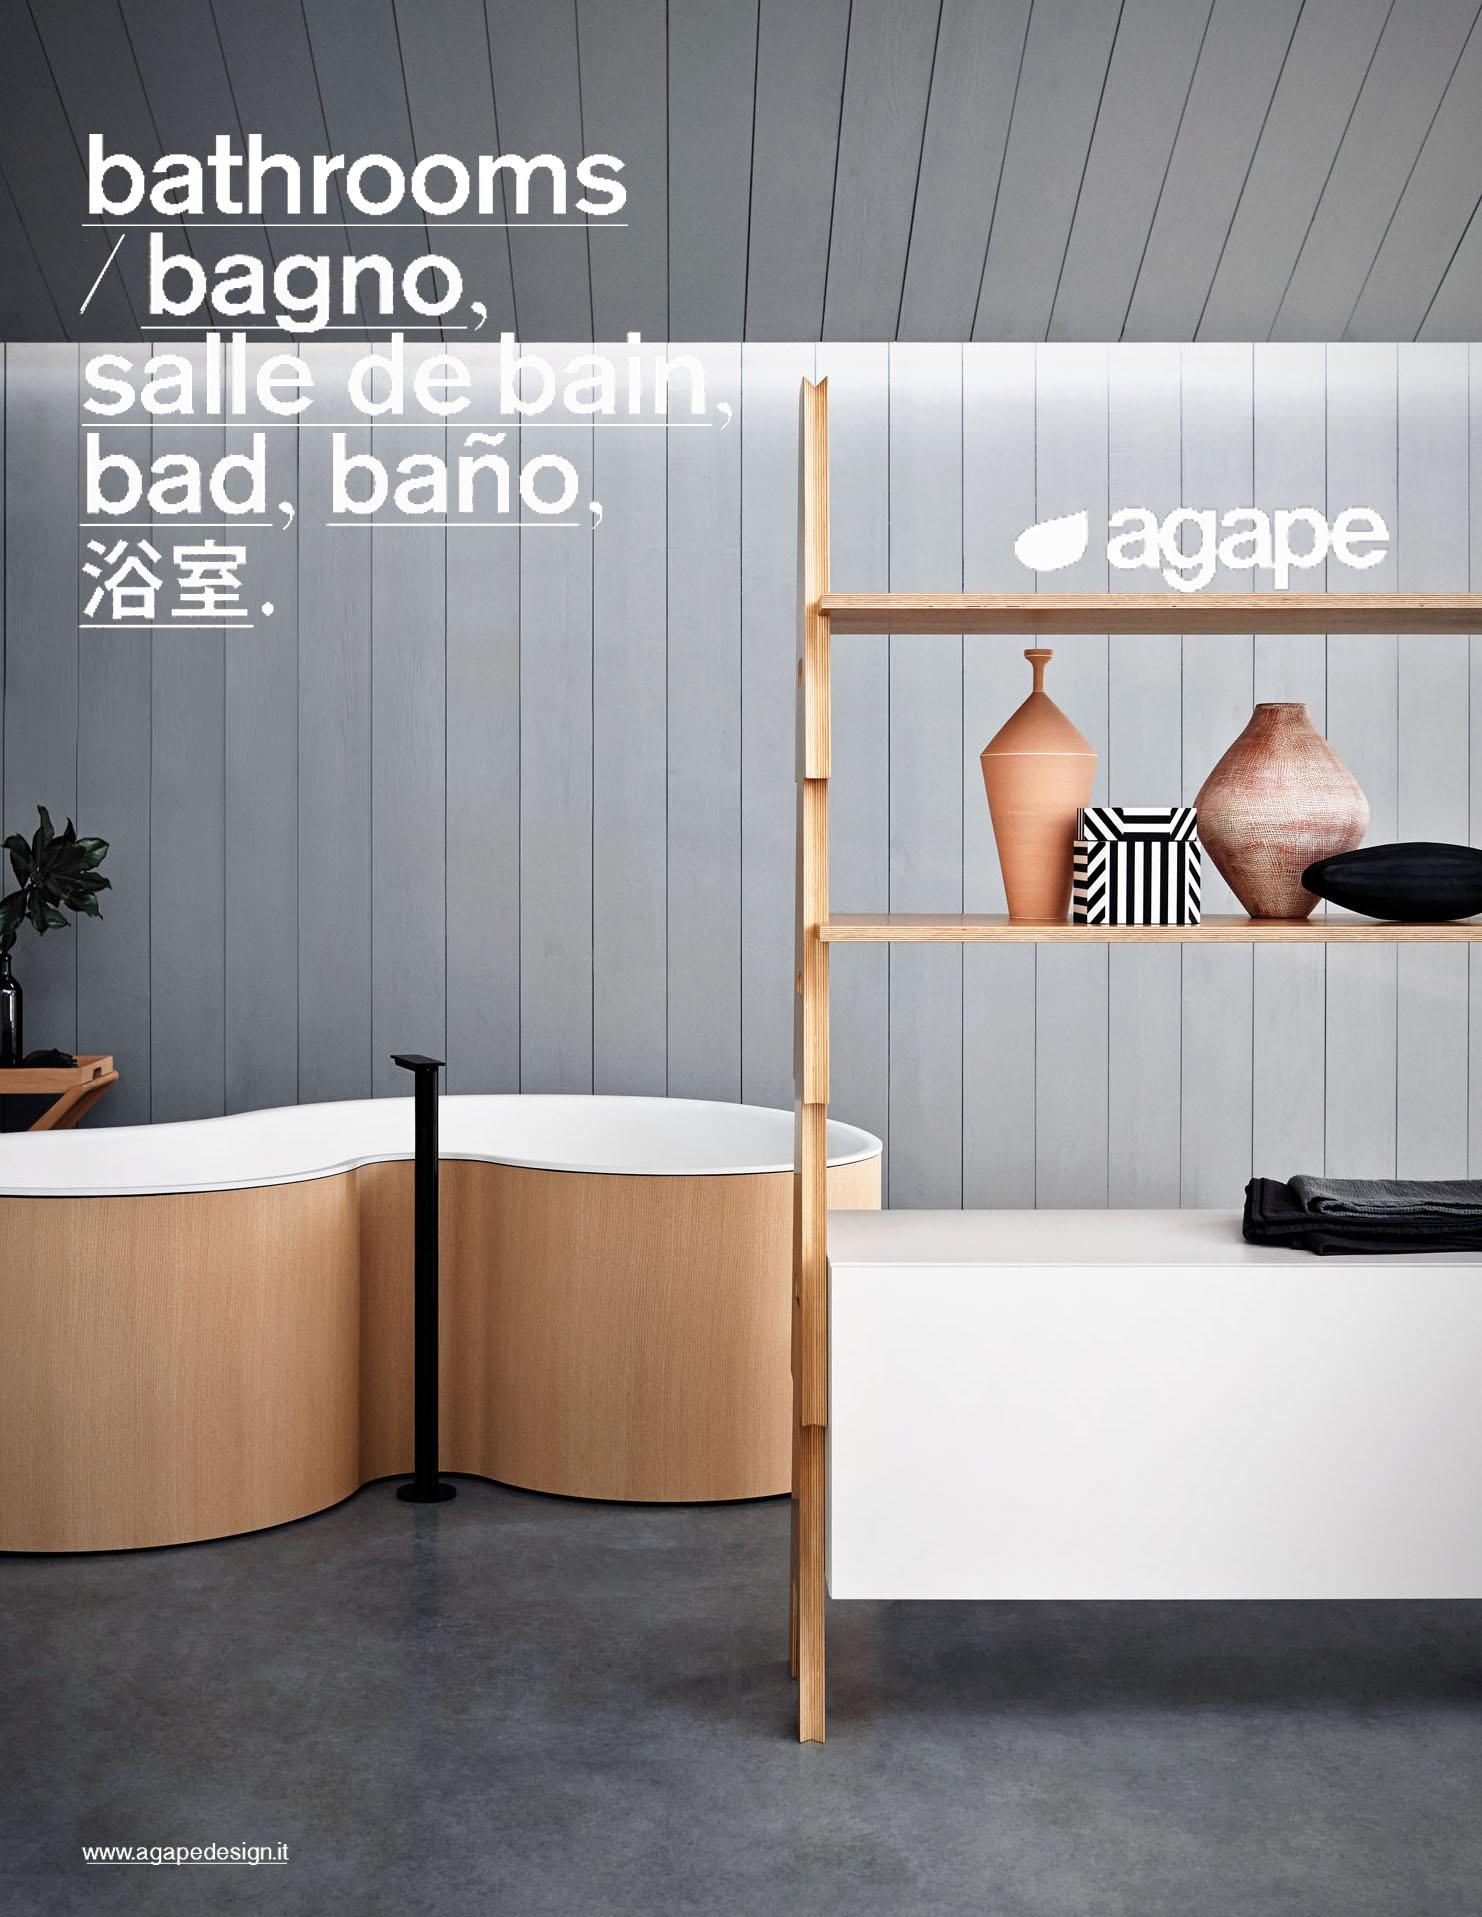 Agape 2015 Campaign | Andrea Ferrari | Agape | Numerique Retouch Photo Retouching Studio